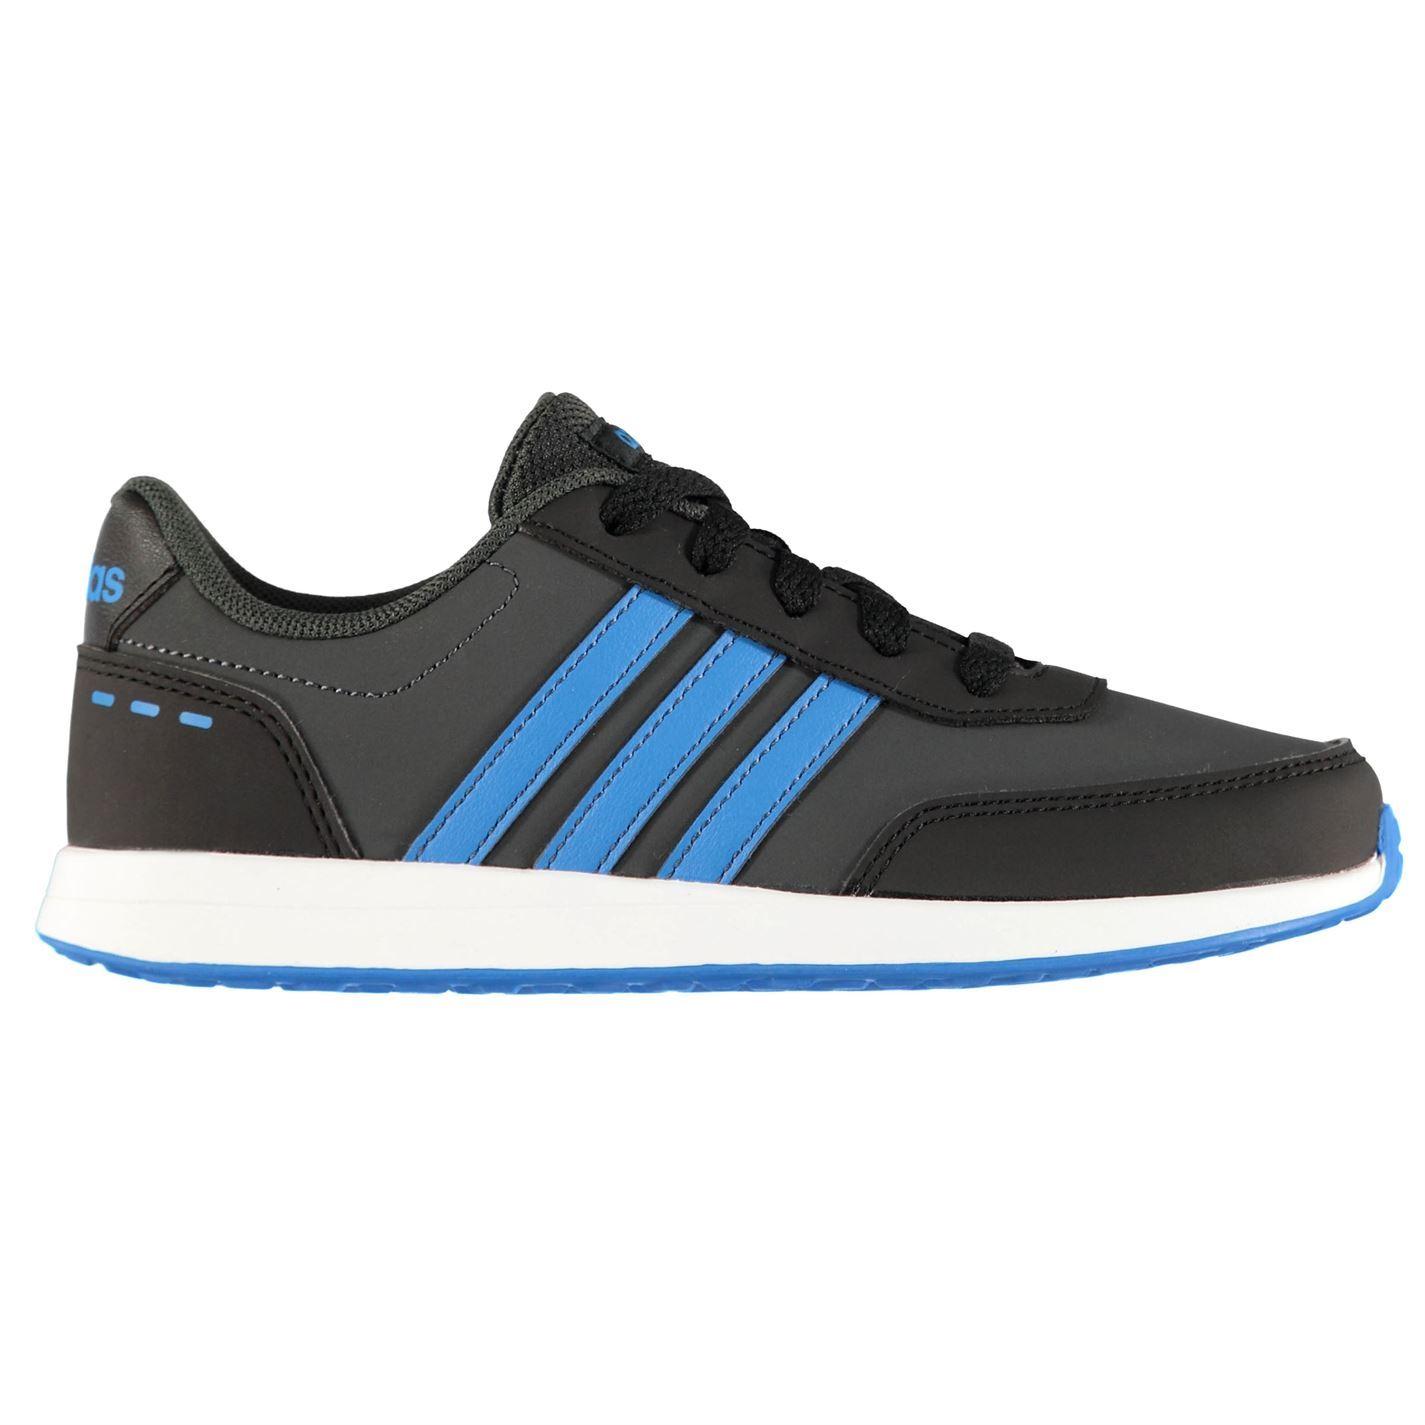 miniatura 10 - ADIDAS-Switch-Nubuck-Scarpe-da-ginnastica-bambino-ragazzo-calzature